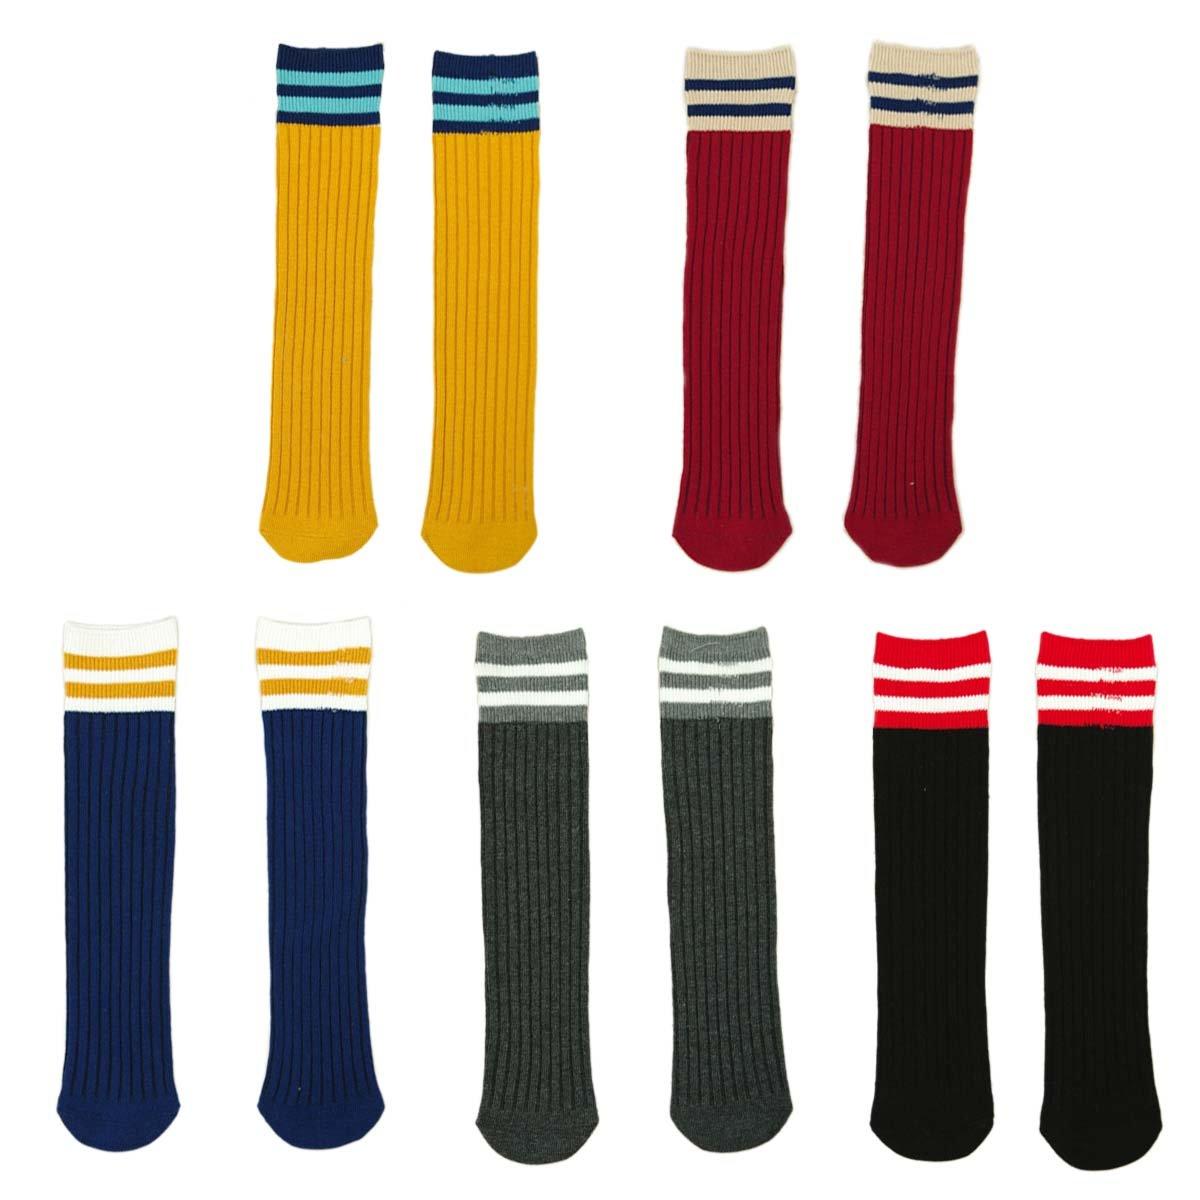 fygood–Set di 5paia calze alte ginocchio Bambino Unisex righe strisce S(3-4ans/longueur 28cm)